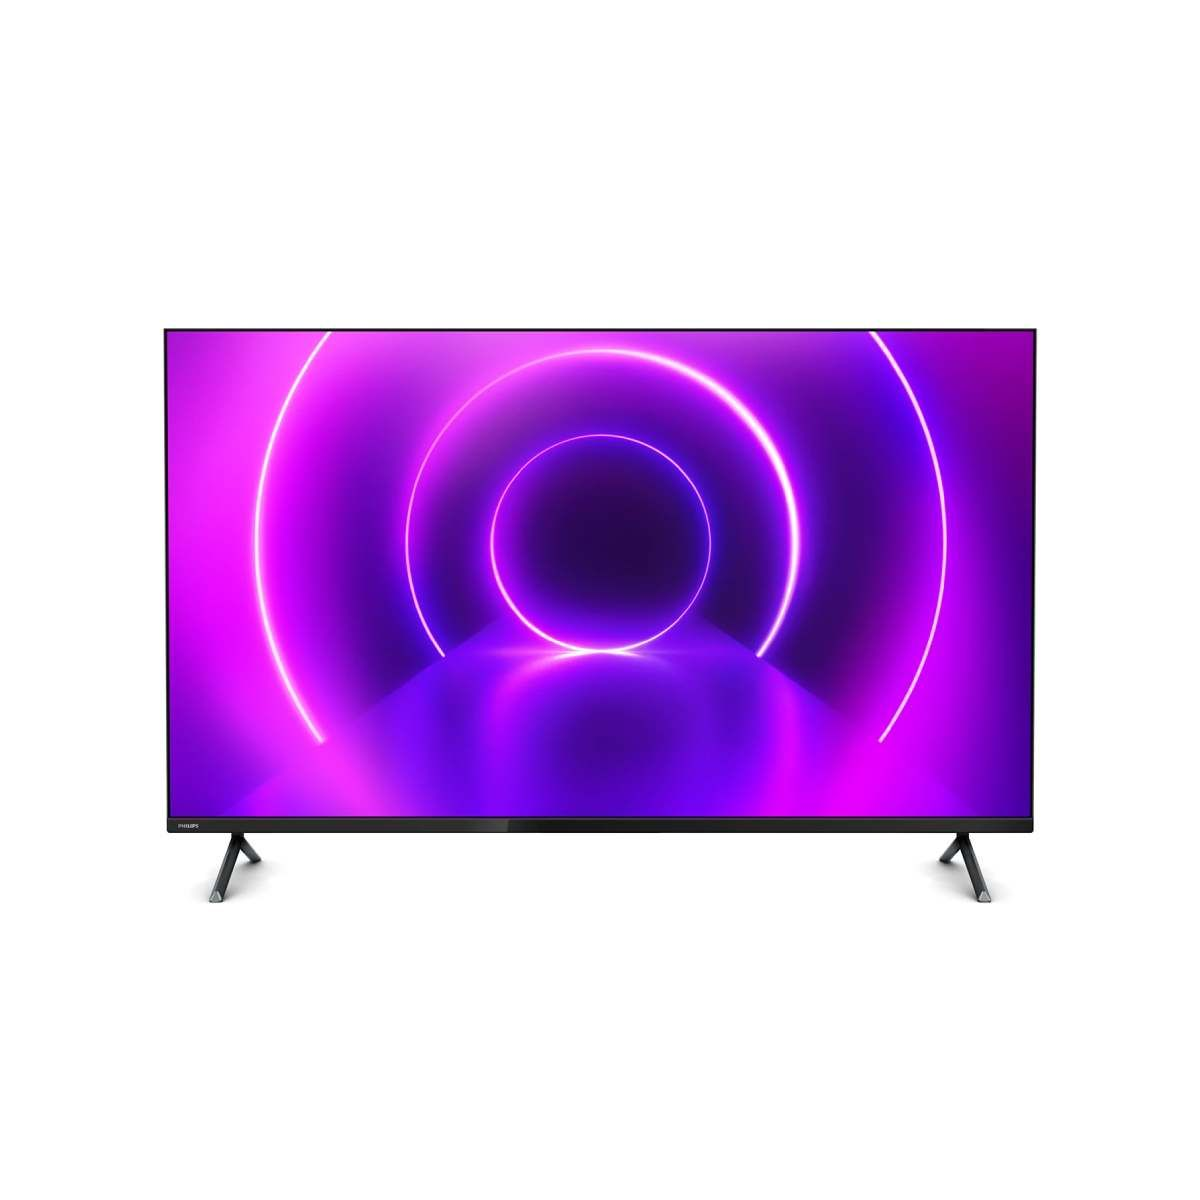 Phillips 65 इंच 4K UHD LED टीवी (65PUT8215/94)